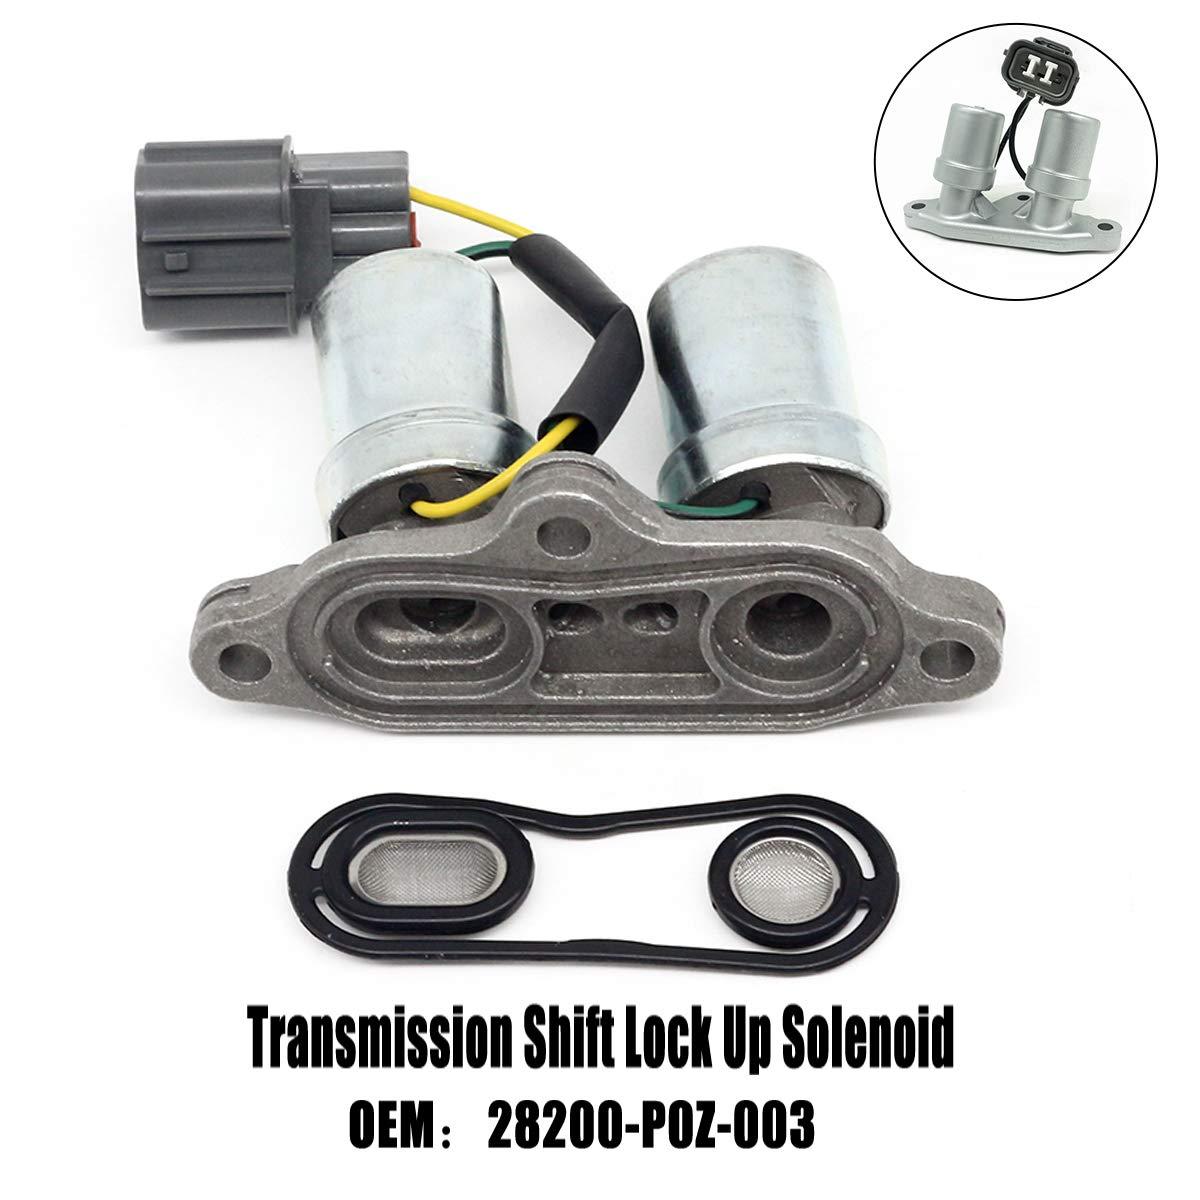 Ford Transmission Lock Up